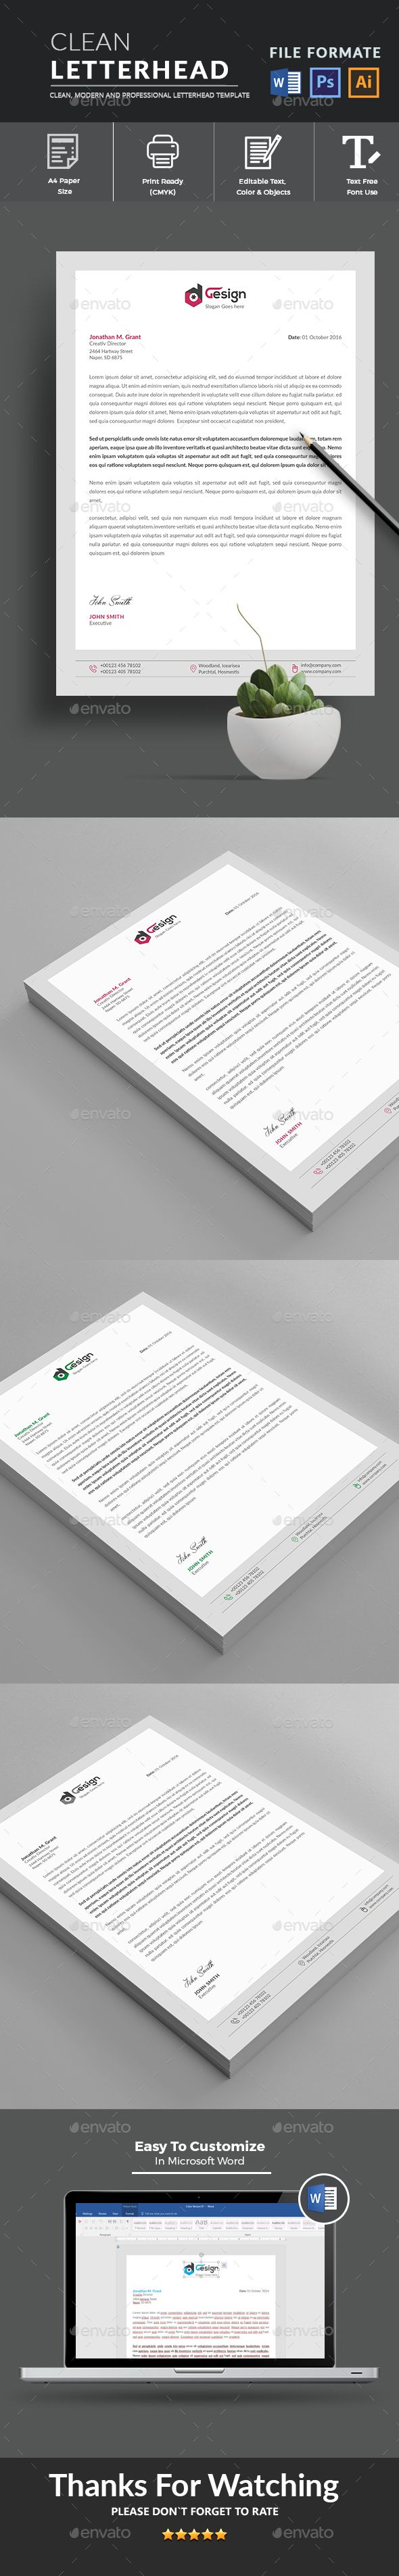 Letterhead - Stationery Print Templates Download here: https://graphicriver.net/item/letterhead/19436707?ref=classicdesignp